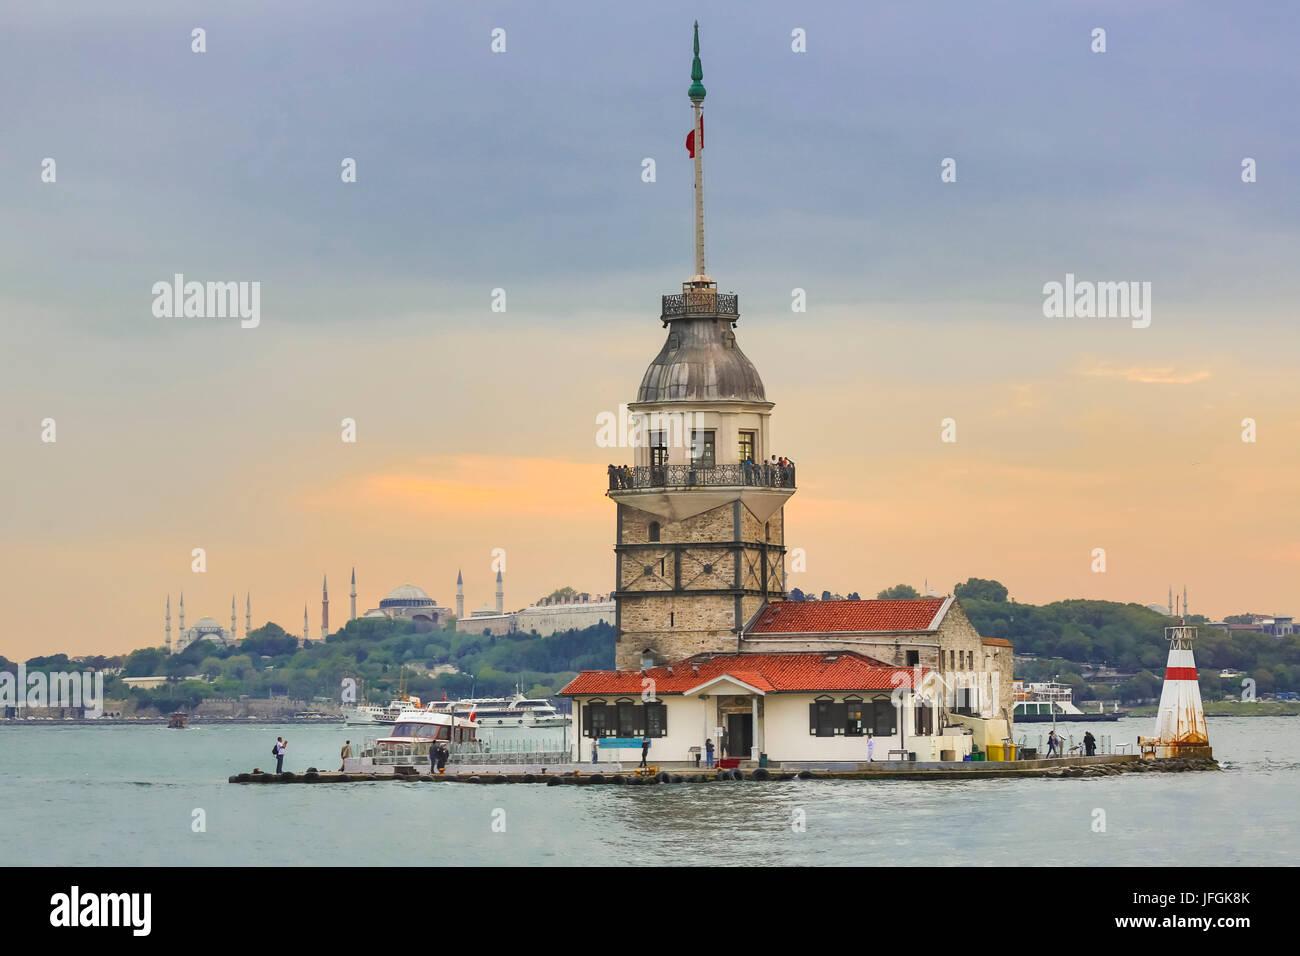 Turkey, Istanbul City, Uskudar, Maiden´s Tower Island, Kiz Kulesi, and thye Golden Horn - Stock Image